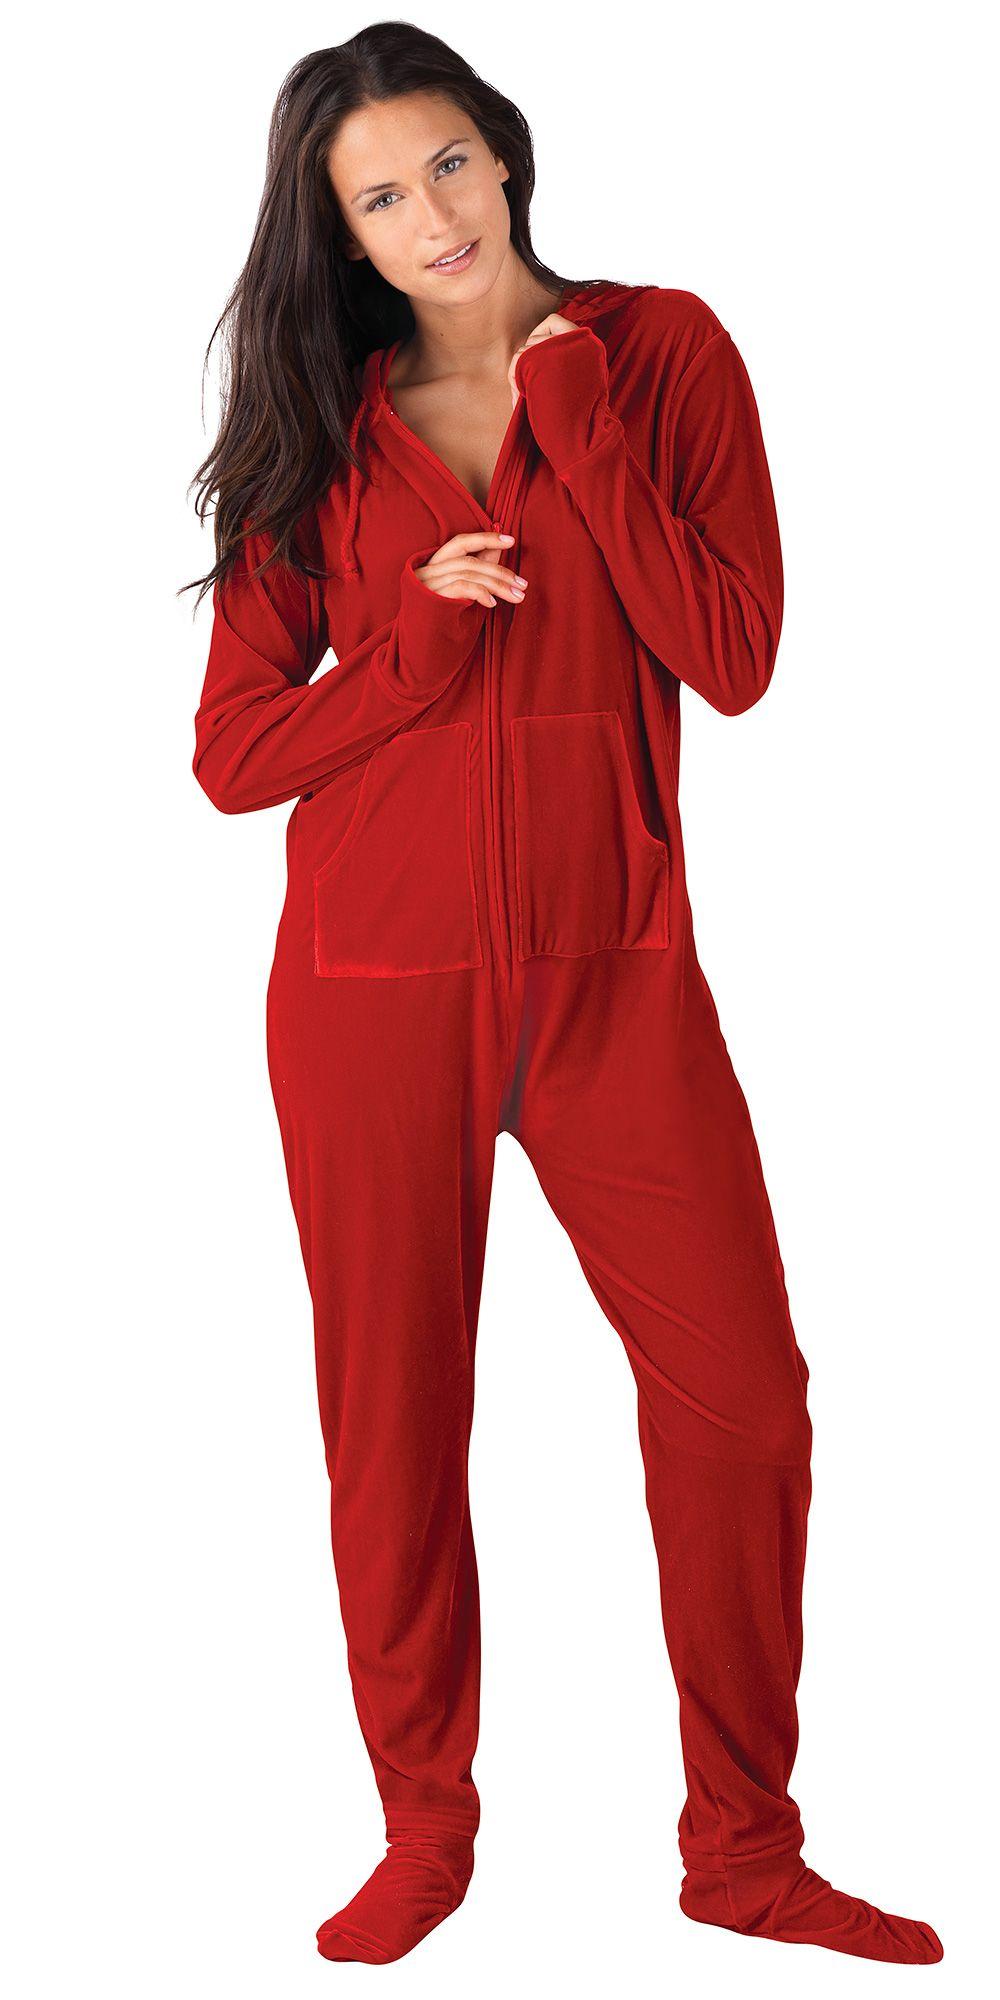 Ruby Velour Hoodie-Footie for Women - Onesie Pajamas from PajamaGram.   99.99  HoodieFootie  Velour  Pajamas e2887e86d